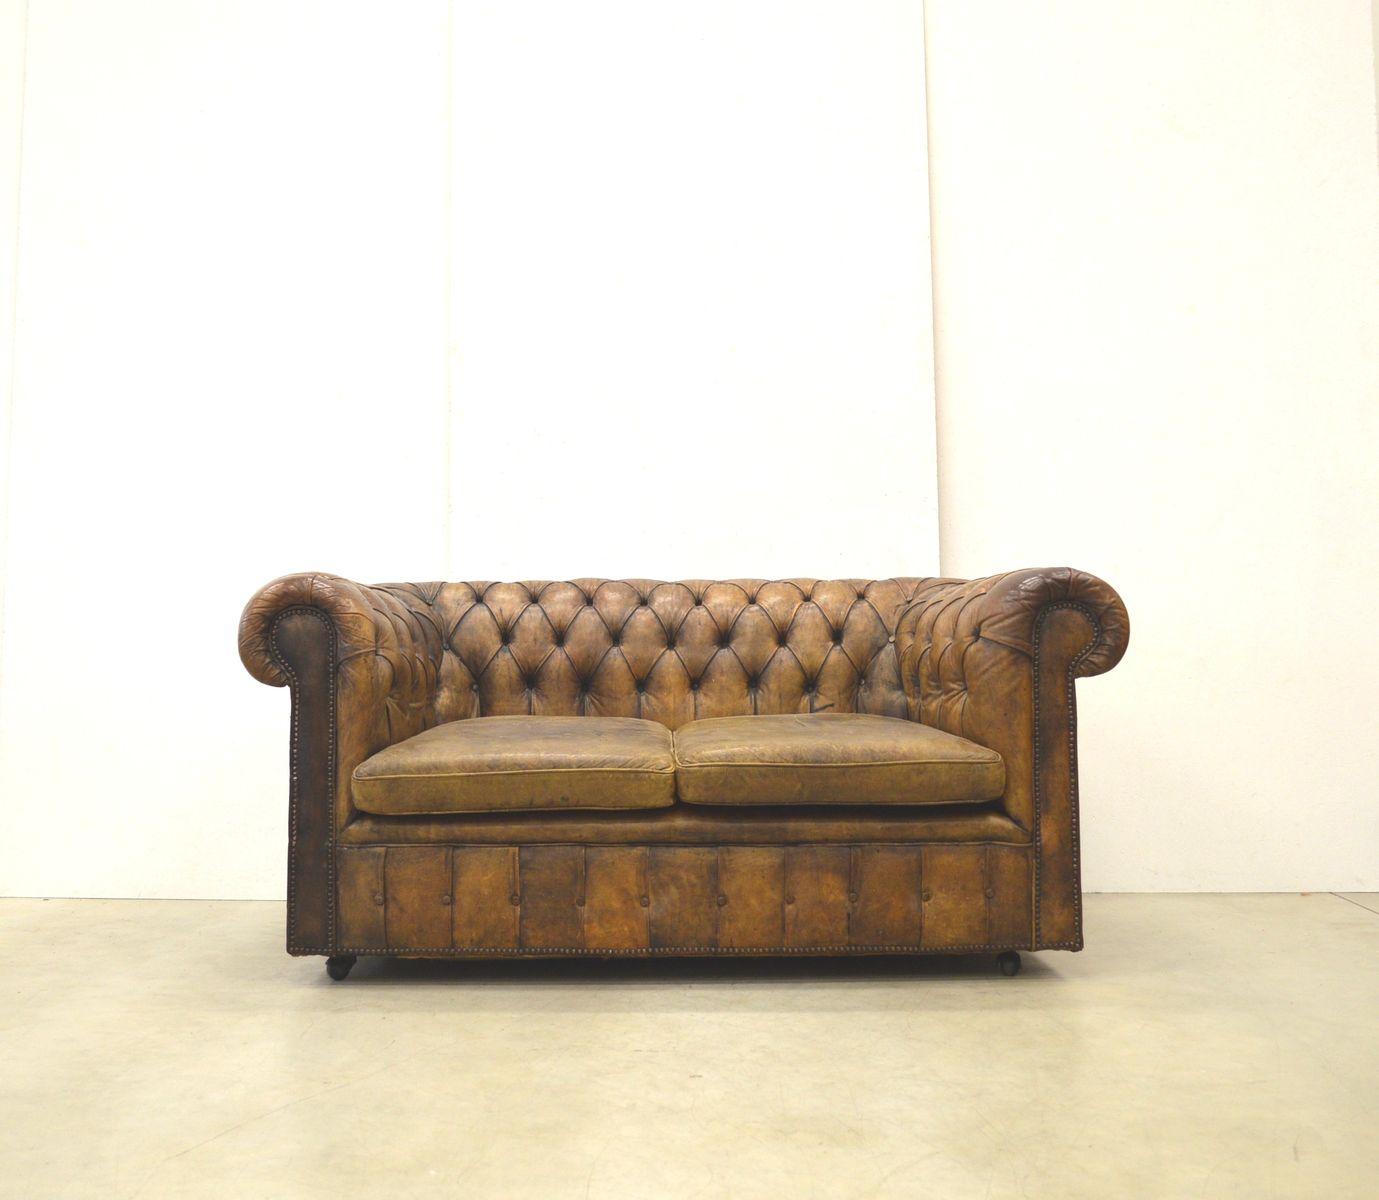 englisches art deco chesterfield 2 sitzer leder sofa in. Black Bedroom Furniture Sets. Home Design Ideas